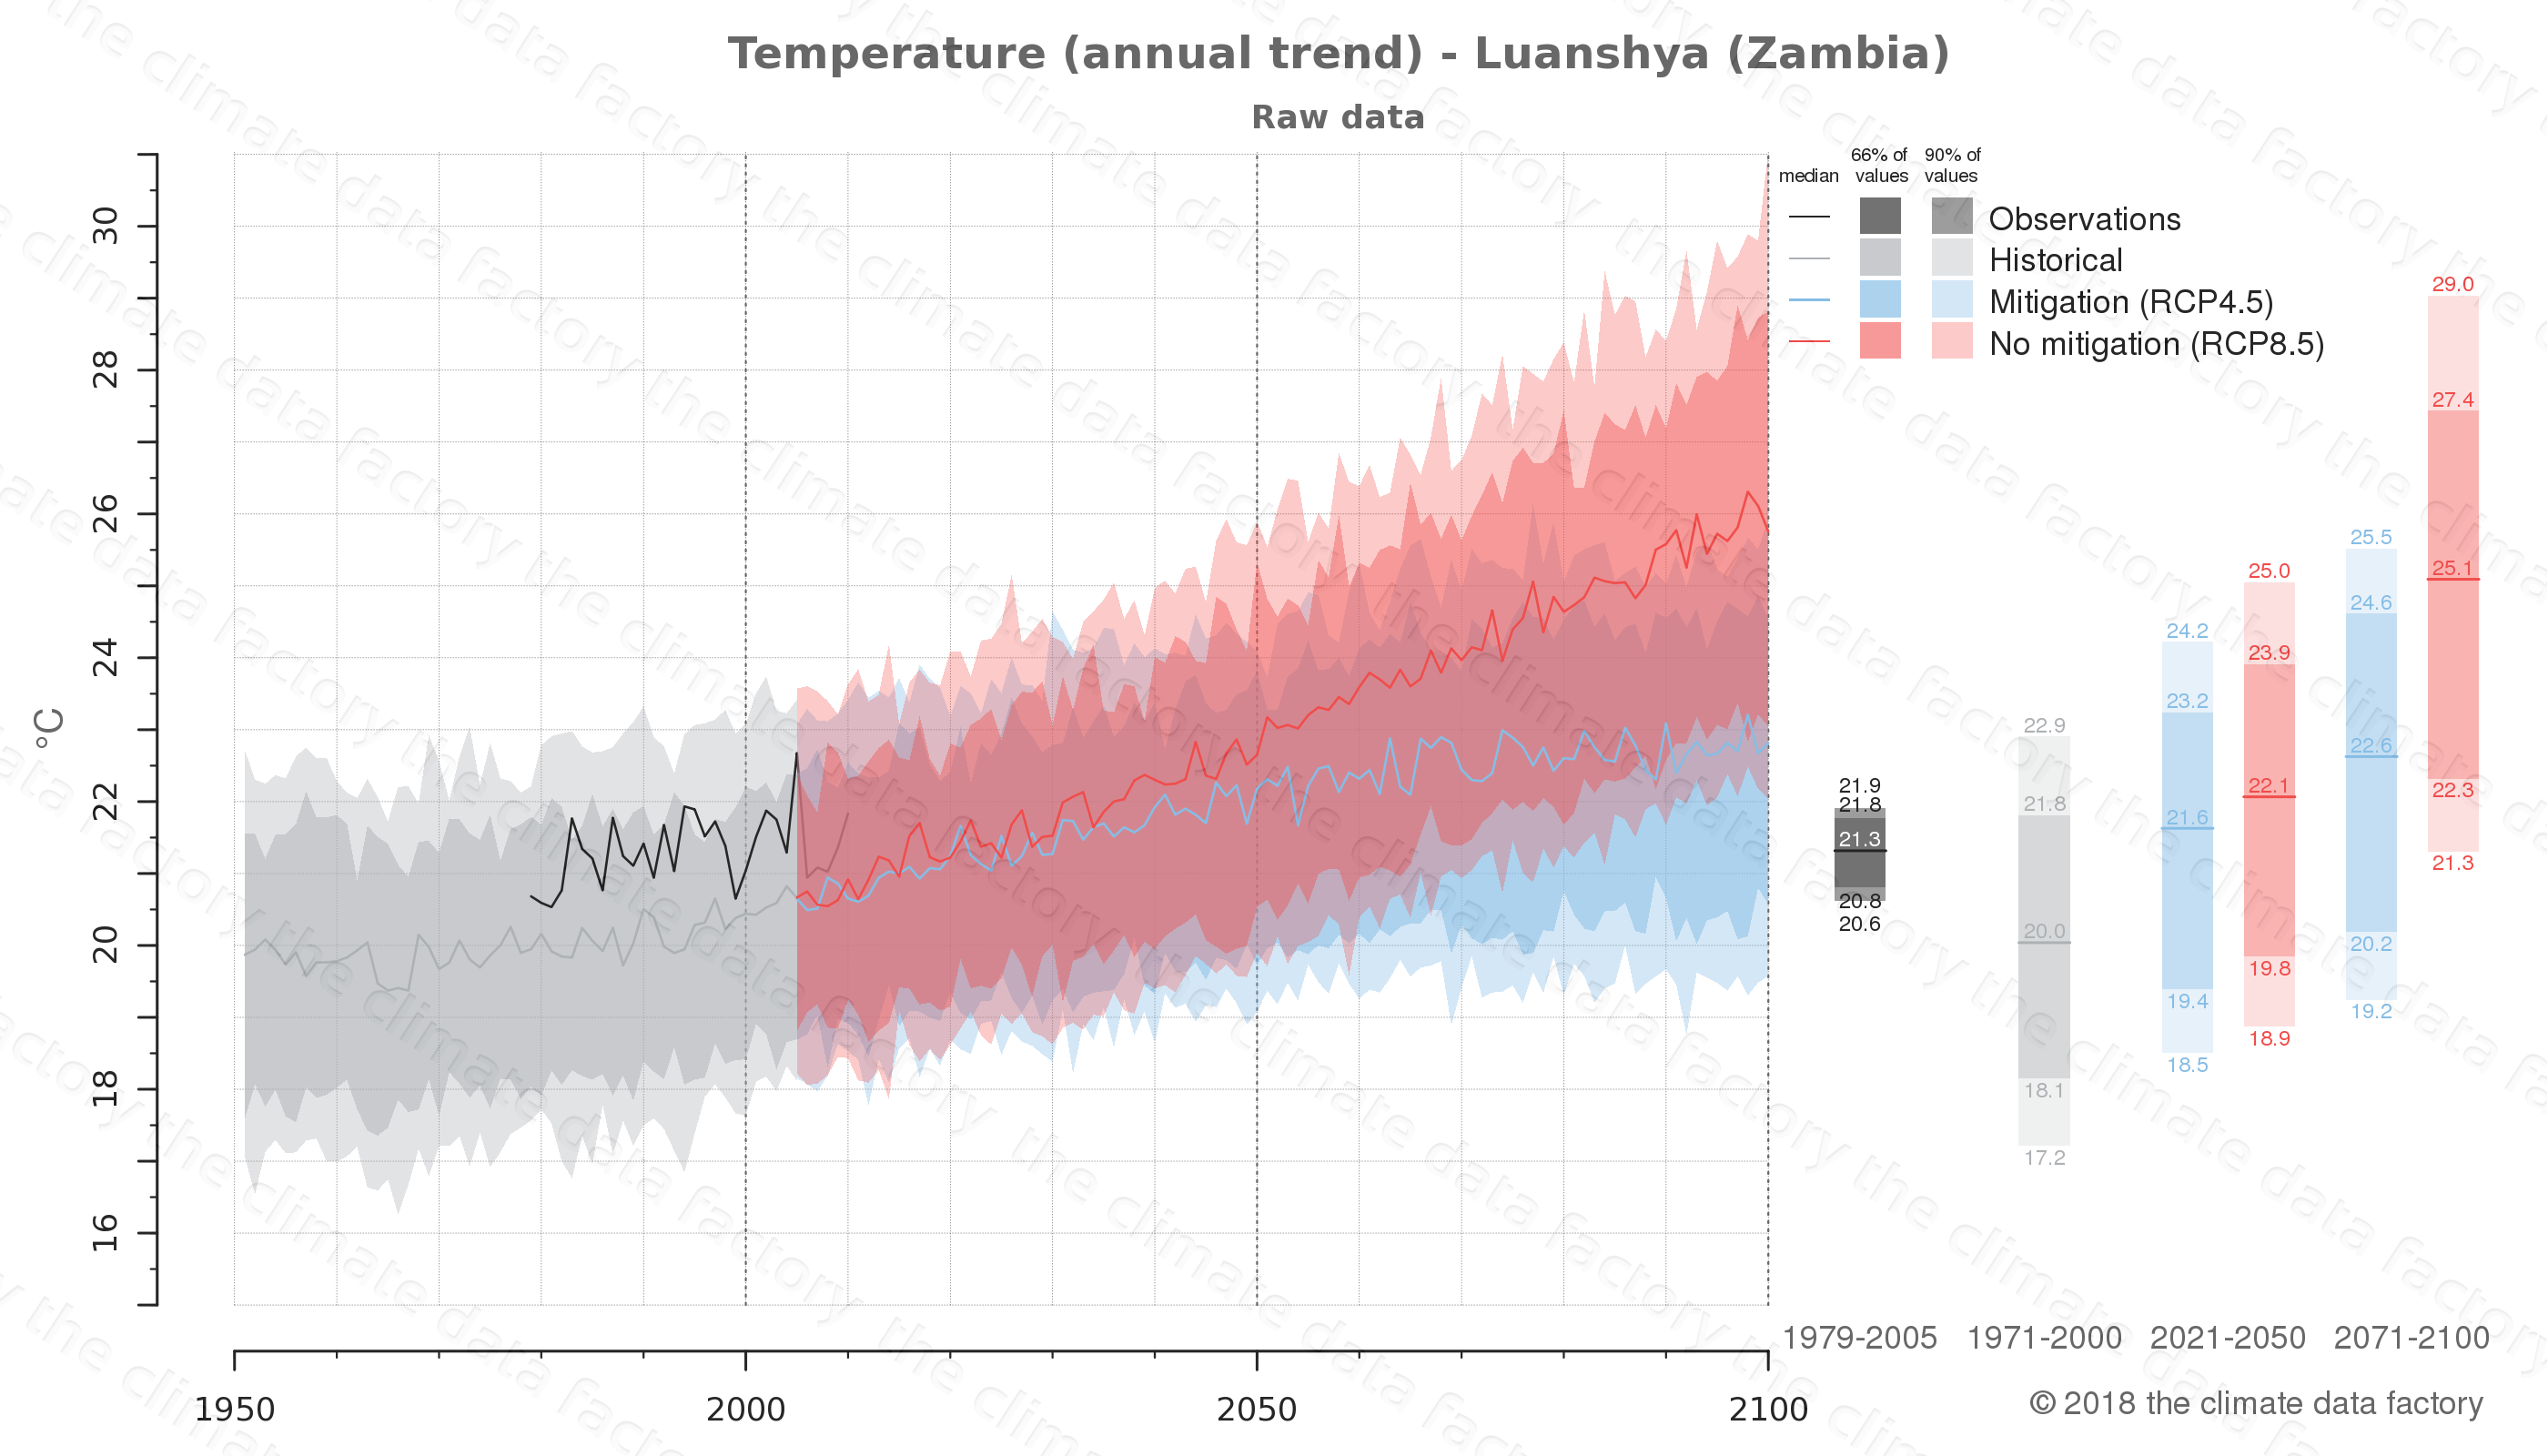 climate change data policy adaptation climate graph city data temperature luanshya zambia